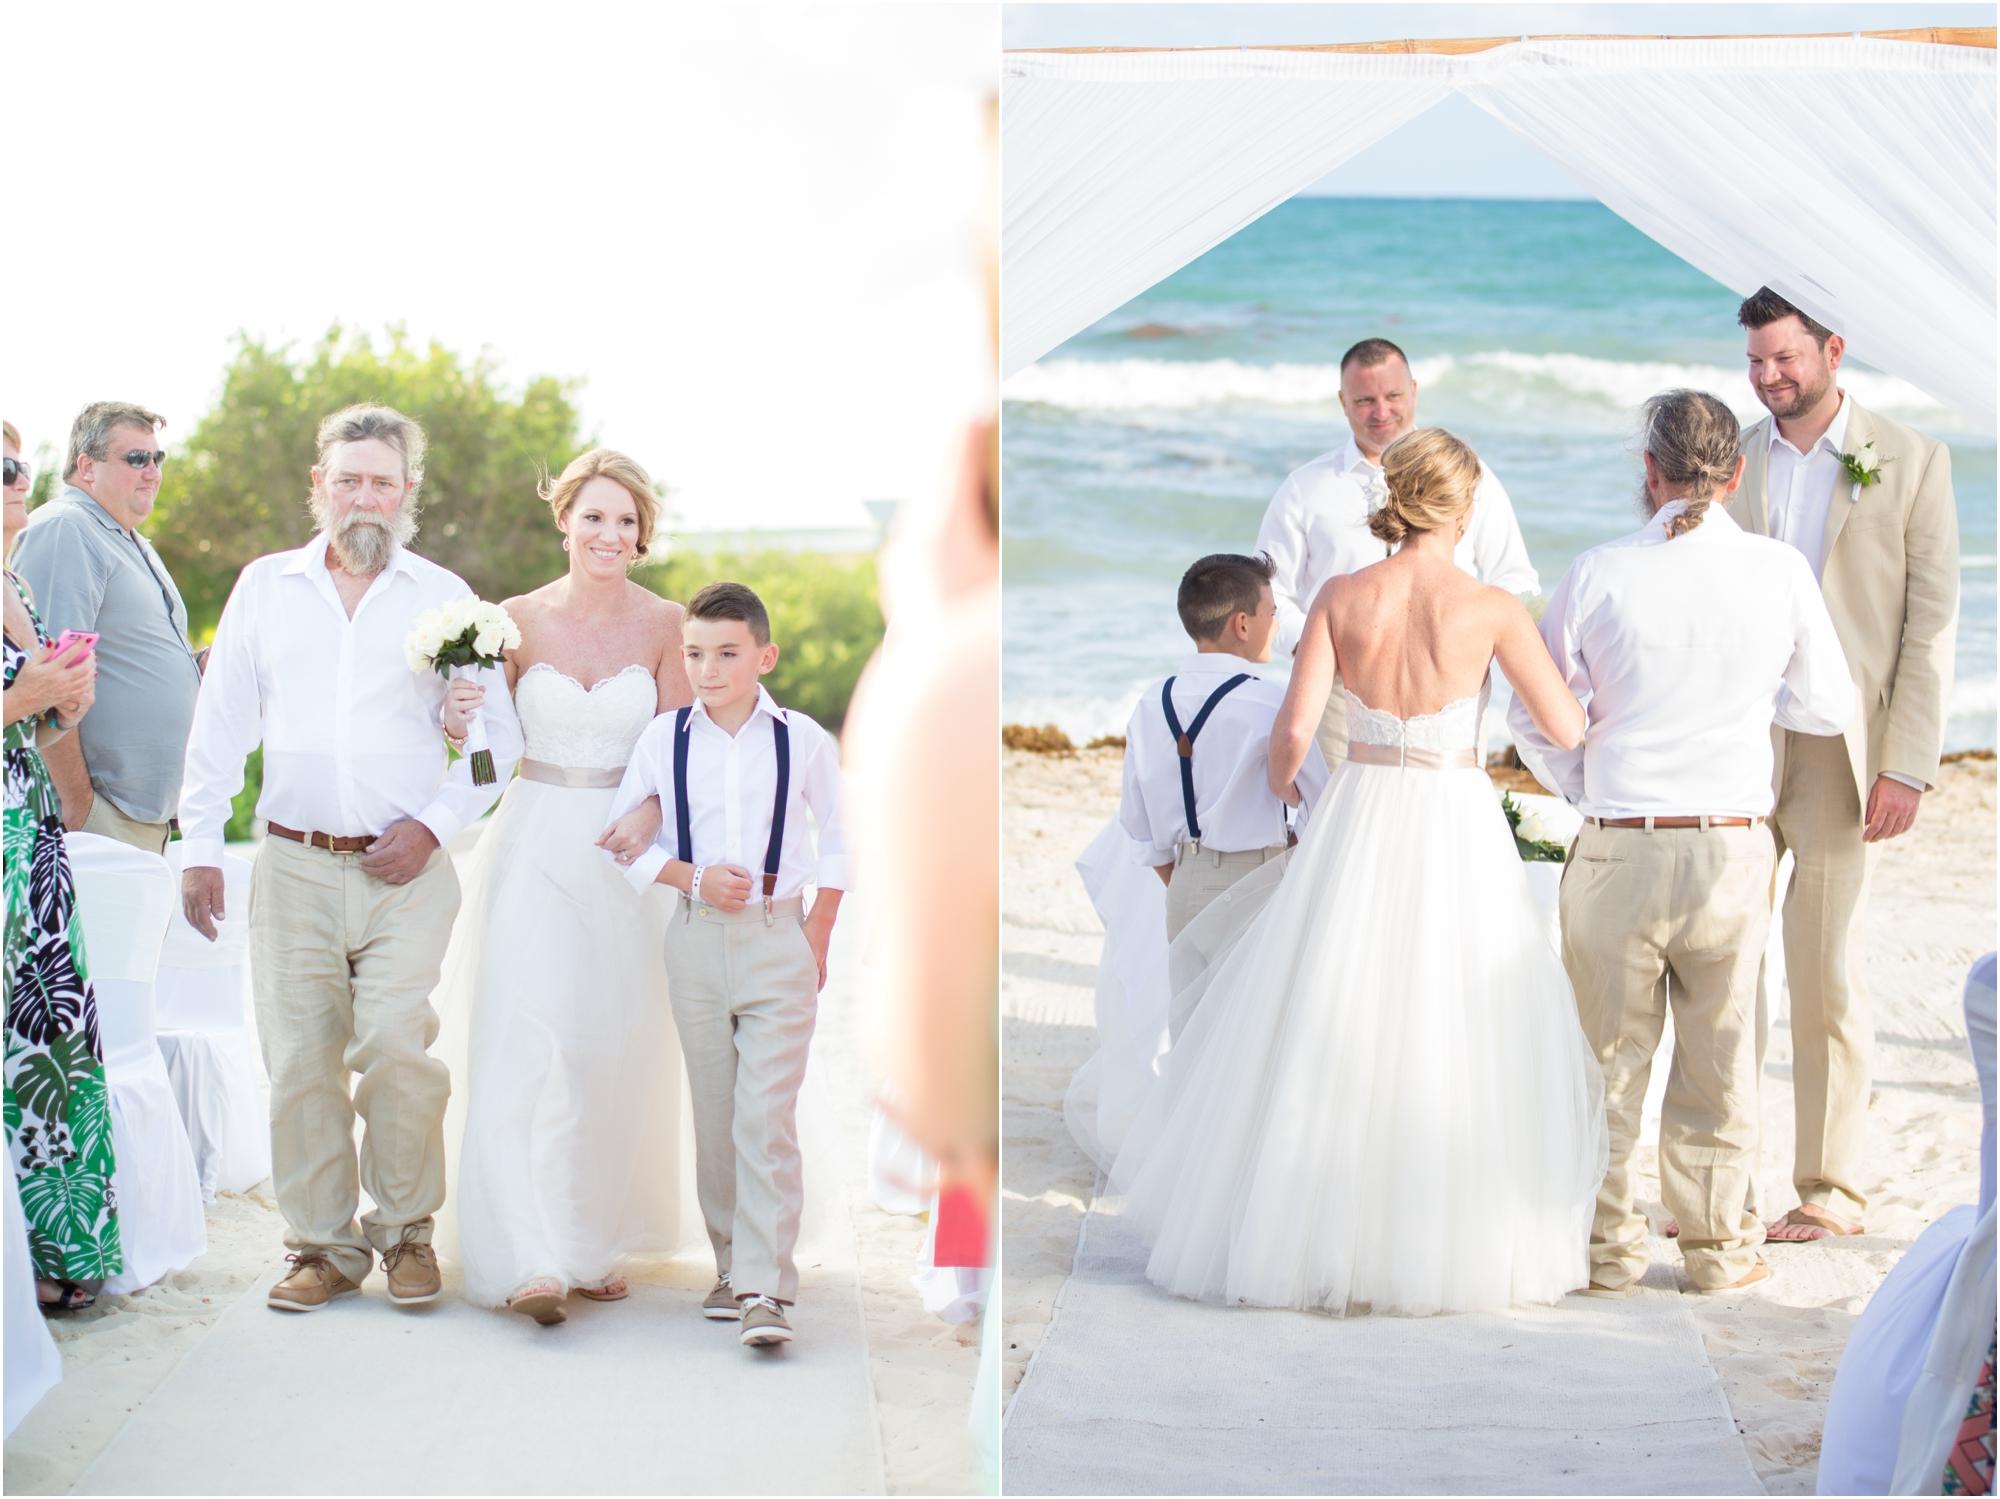 Morosoff Wedding 2-Ceremony-179_anna grace photography destination wedding photographer playa del carmen mexico photo.jpg